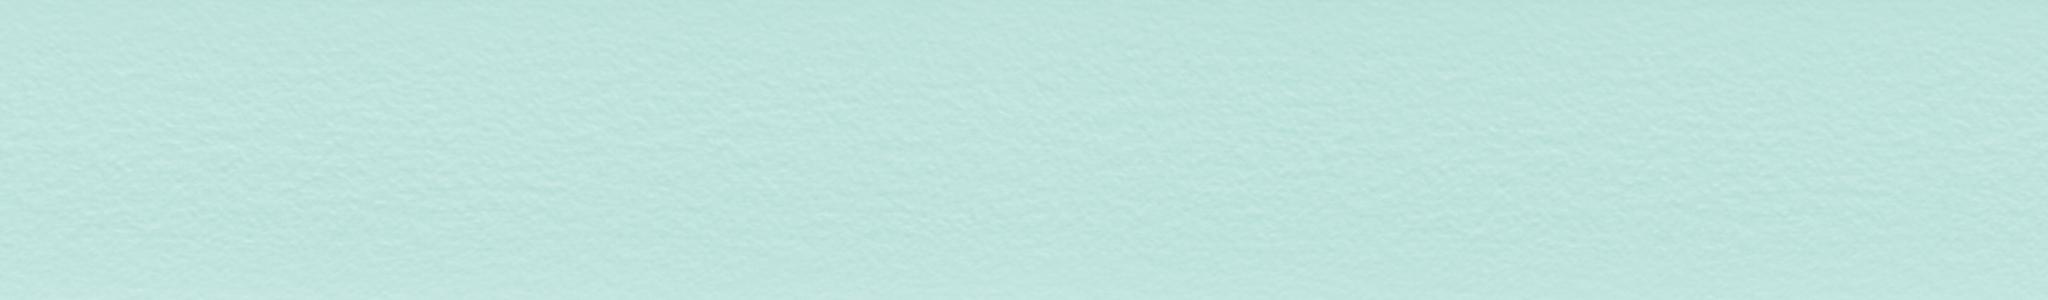 HU 161630 ABS Kante UNI Seegrün feinperl 107